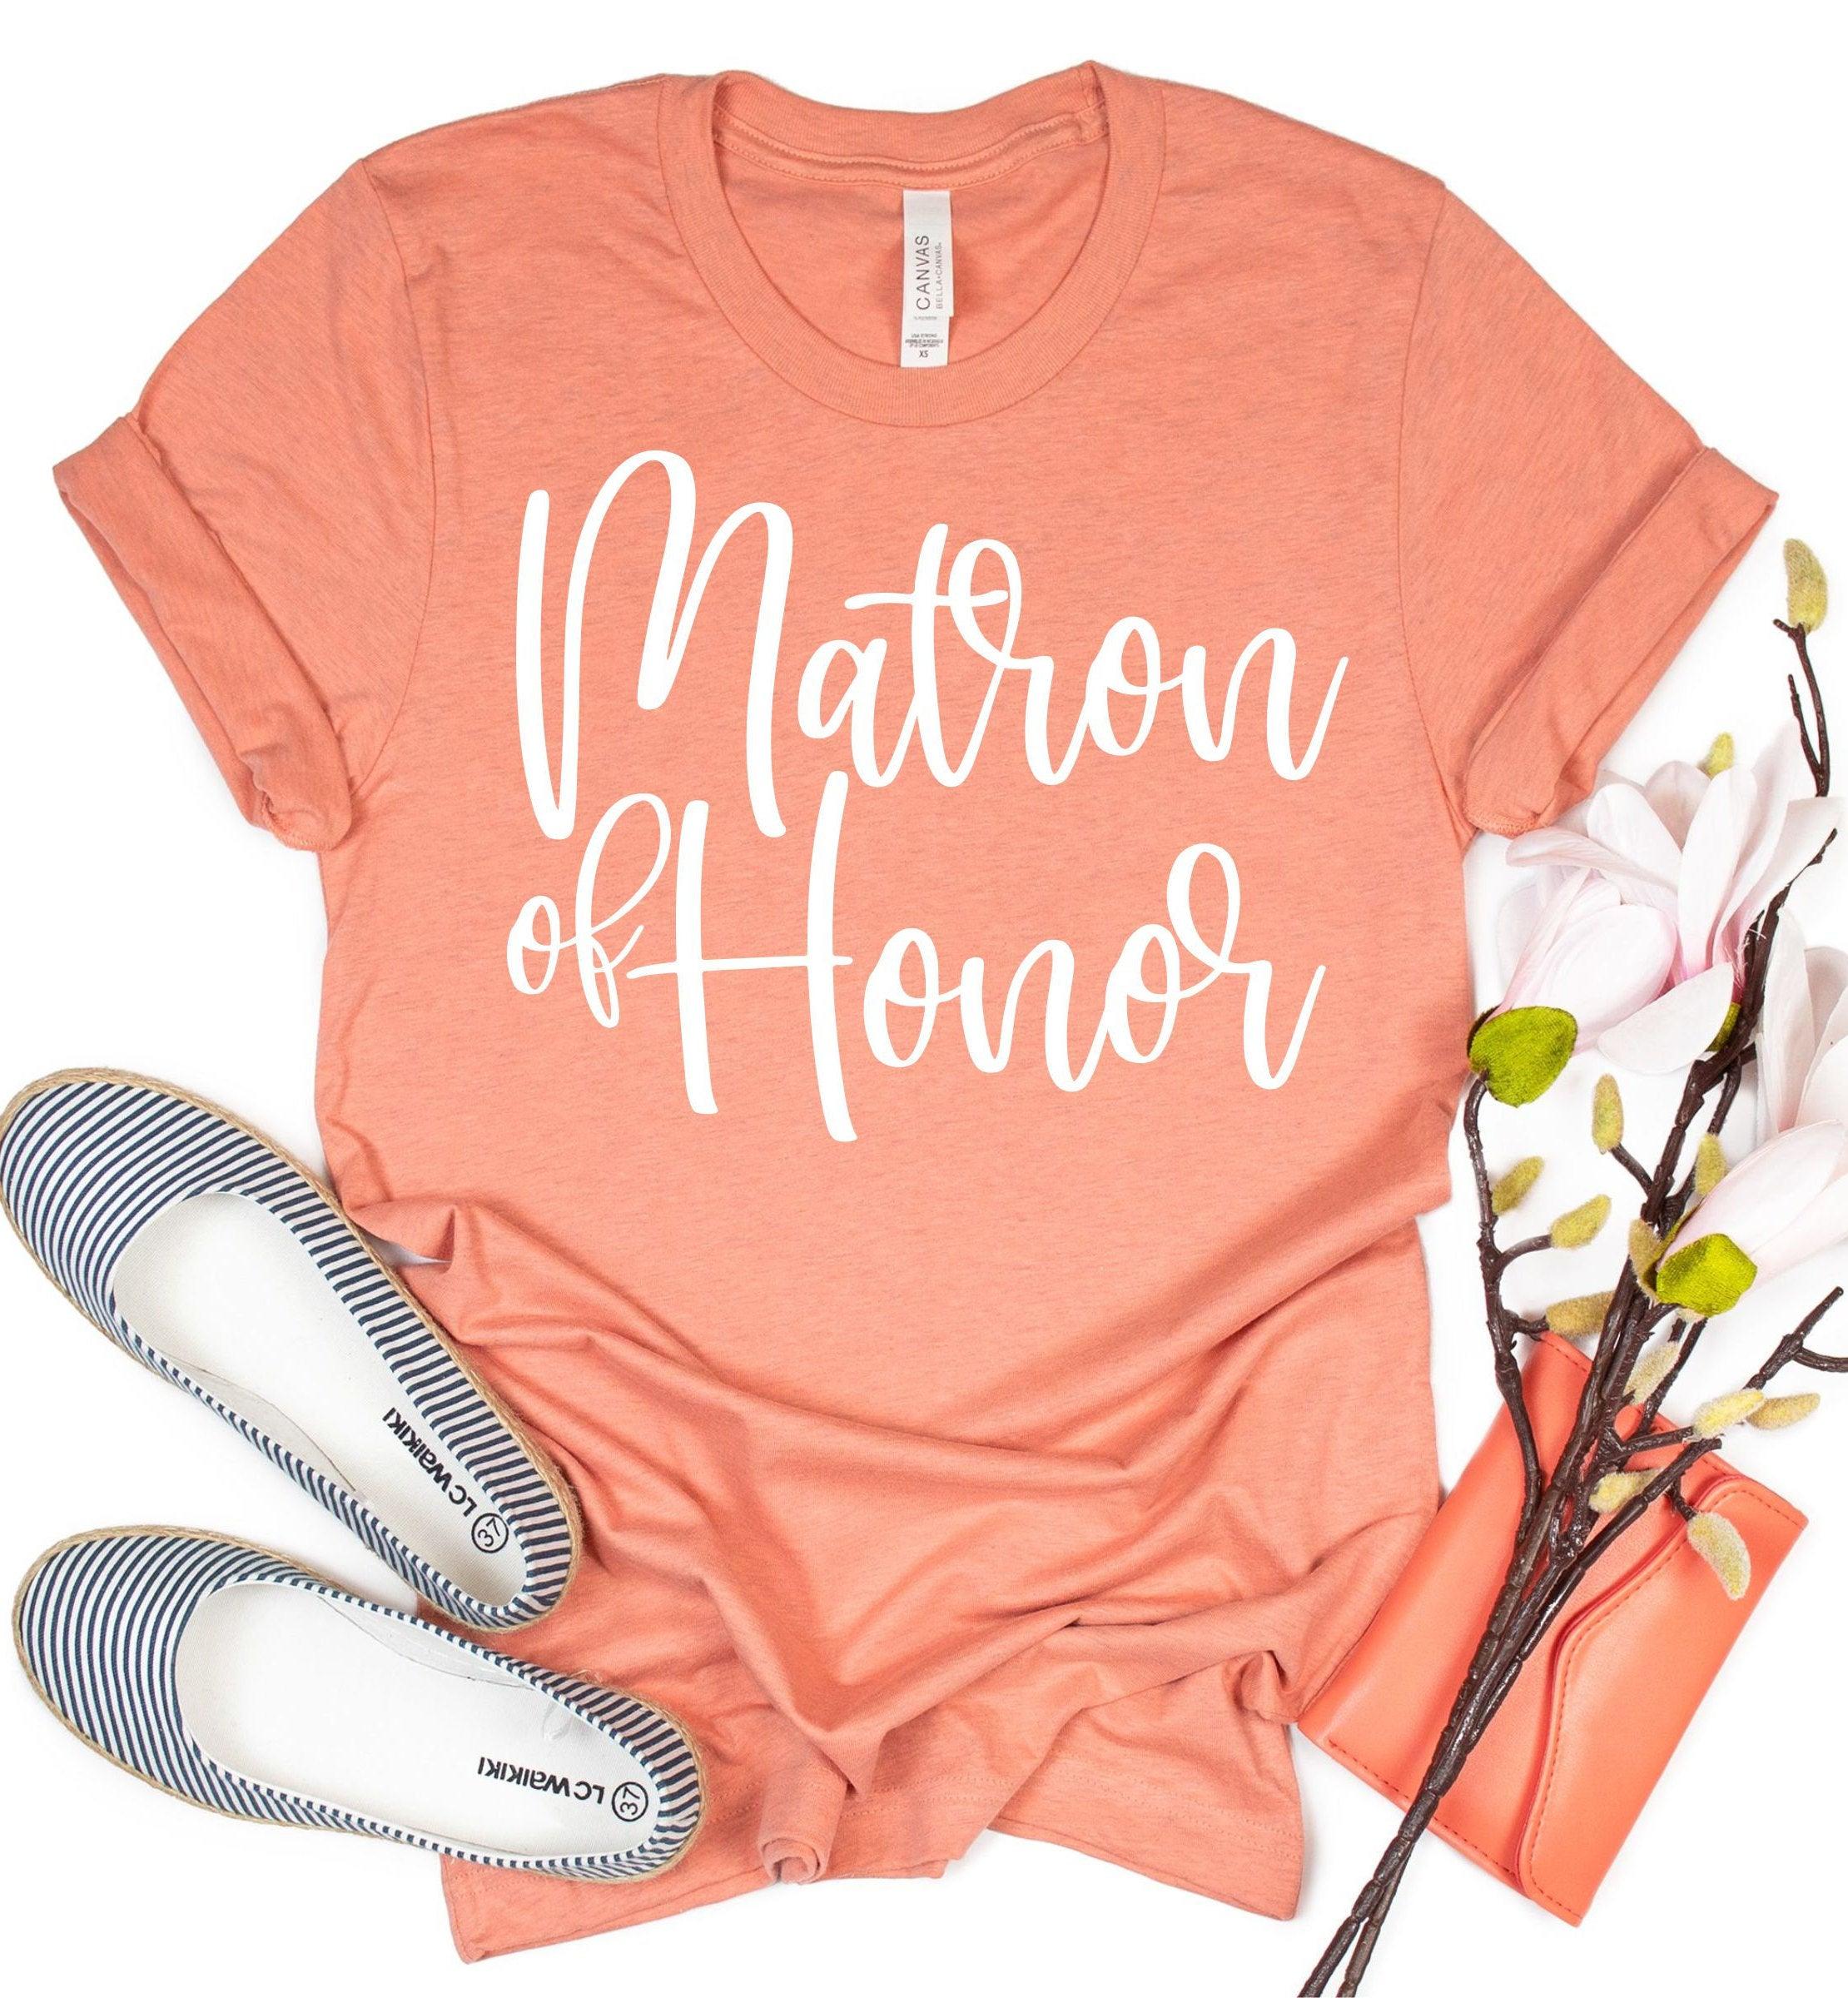 Matron-of-honor-svg-matron-svg-bridesmaid-svg-bridal-party-svg-wedding-svg-design-bachelorette-svg-design-bridesmaid-cricut-svg-2-600a17c0